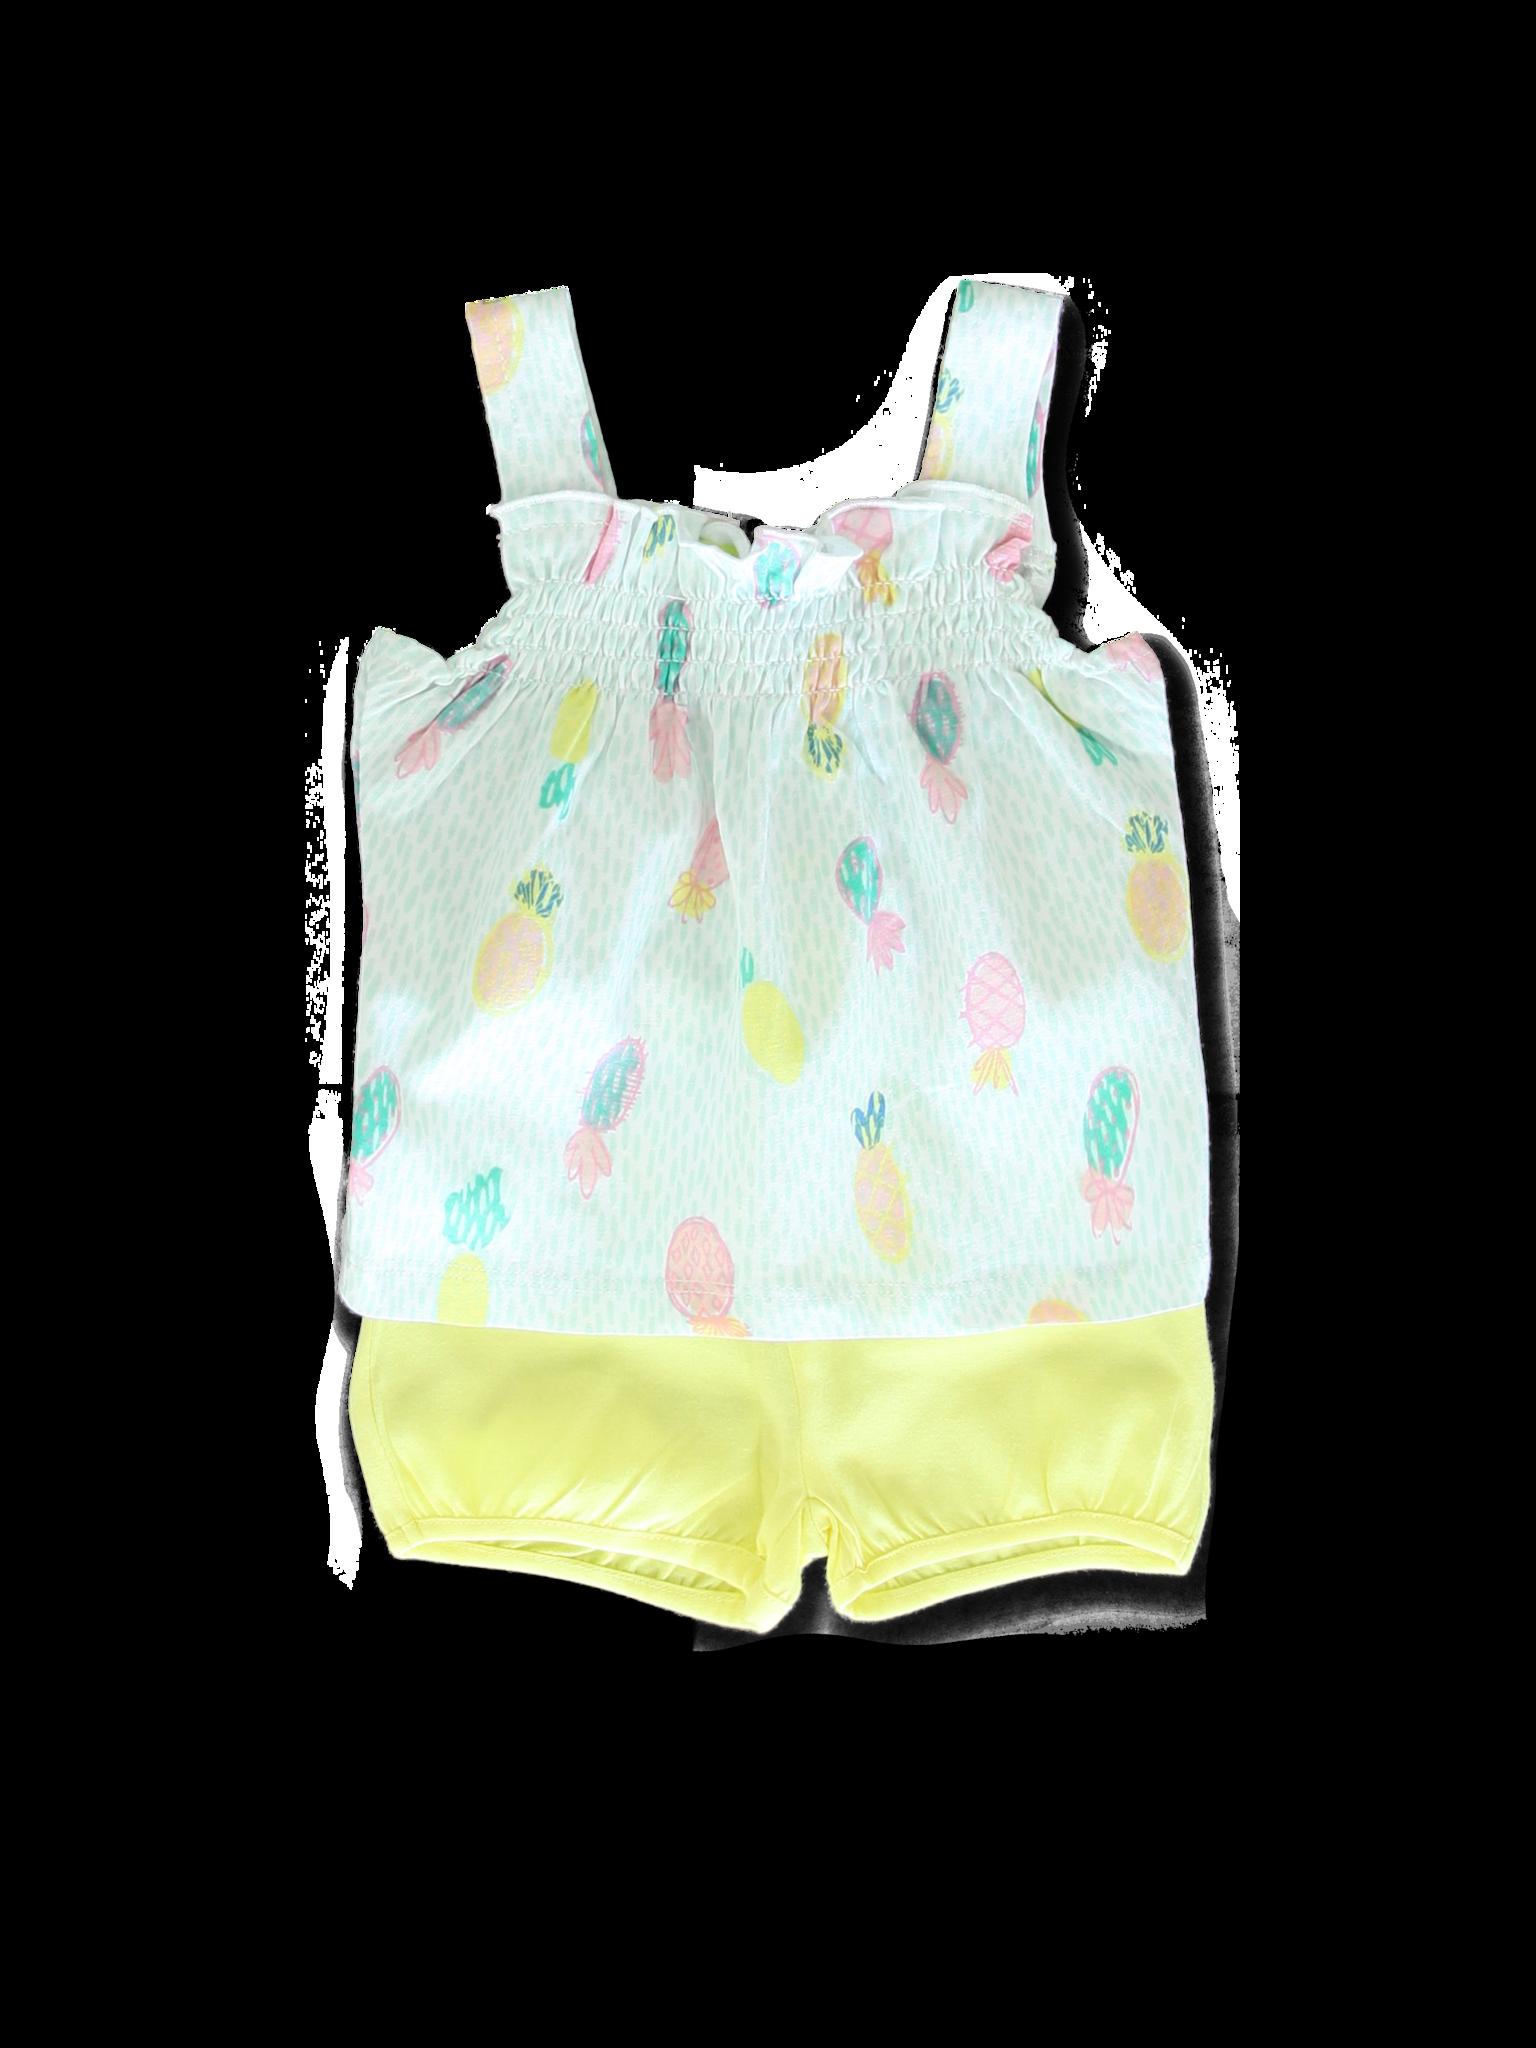 Lemon Beret | Summer 2020 Baby | Set | 8 pcs/box